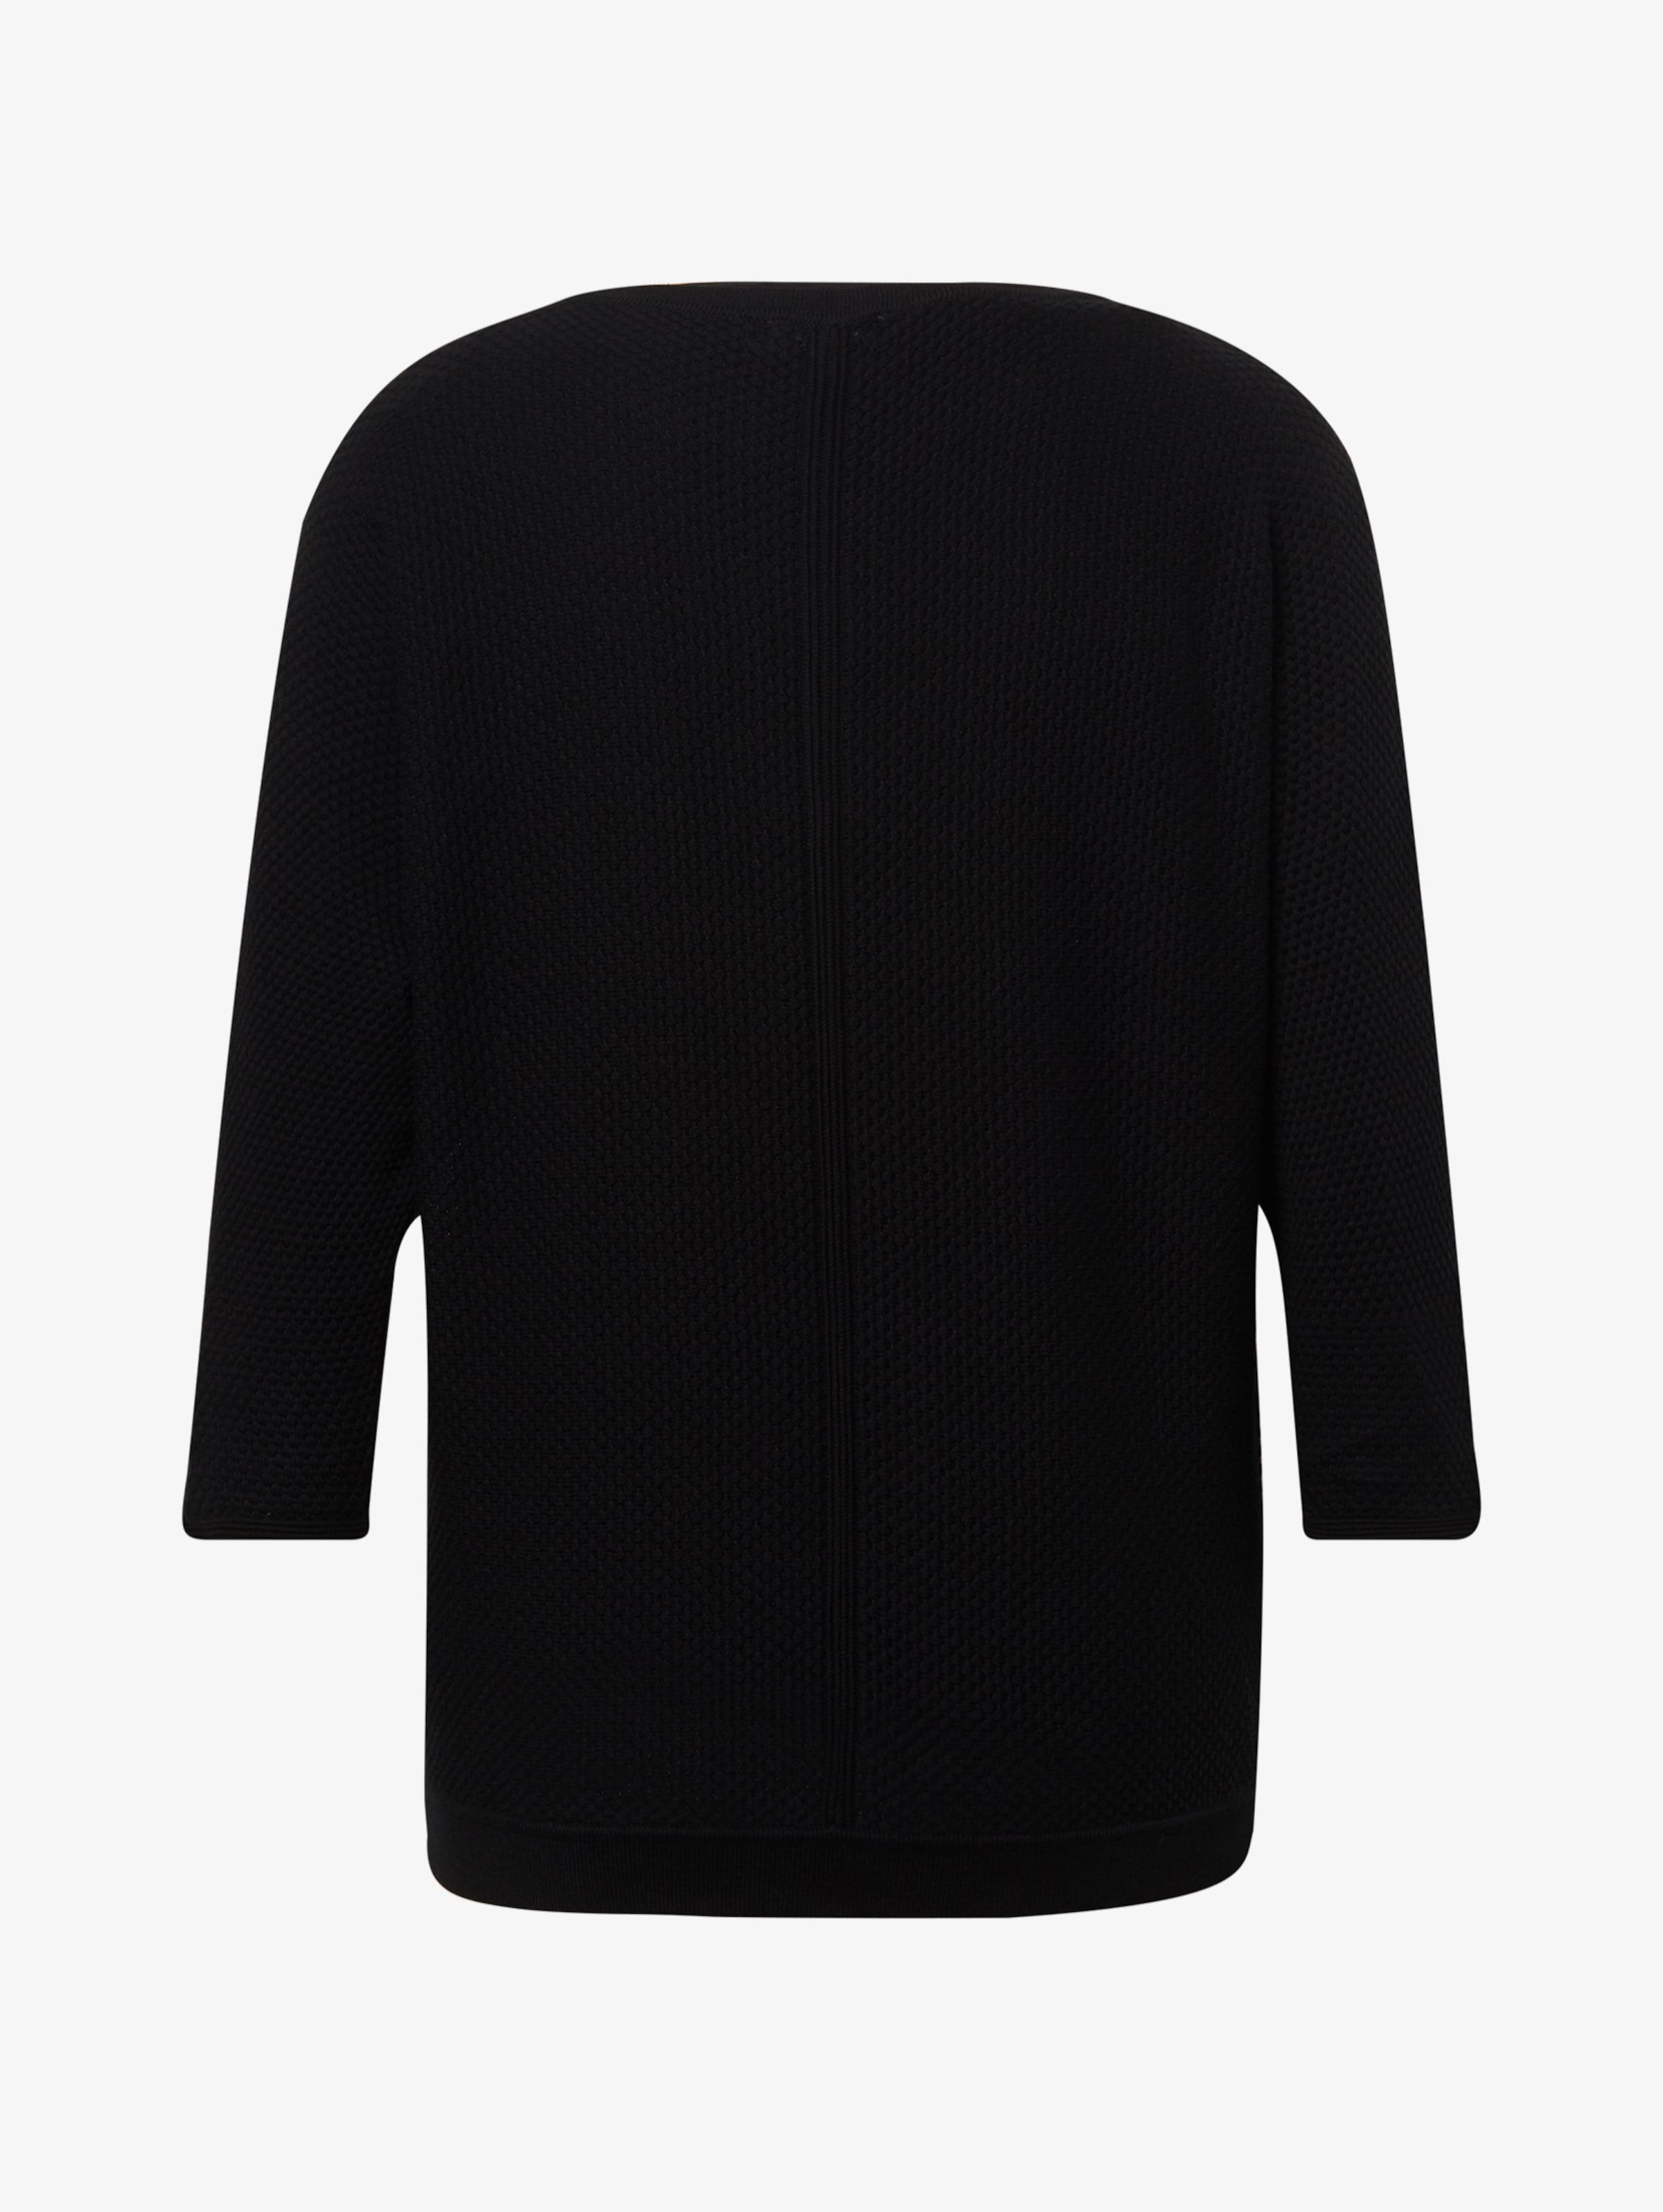 Tom Tom Pullover Pullover Tailor Tom Tailor Pullover In Schwarz Schwarz Tailor In 3uK1JTlFc